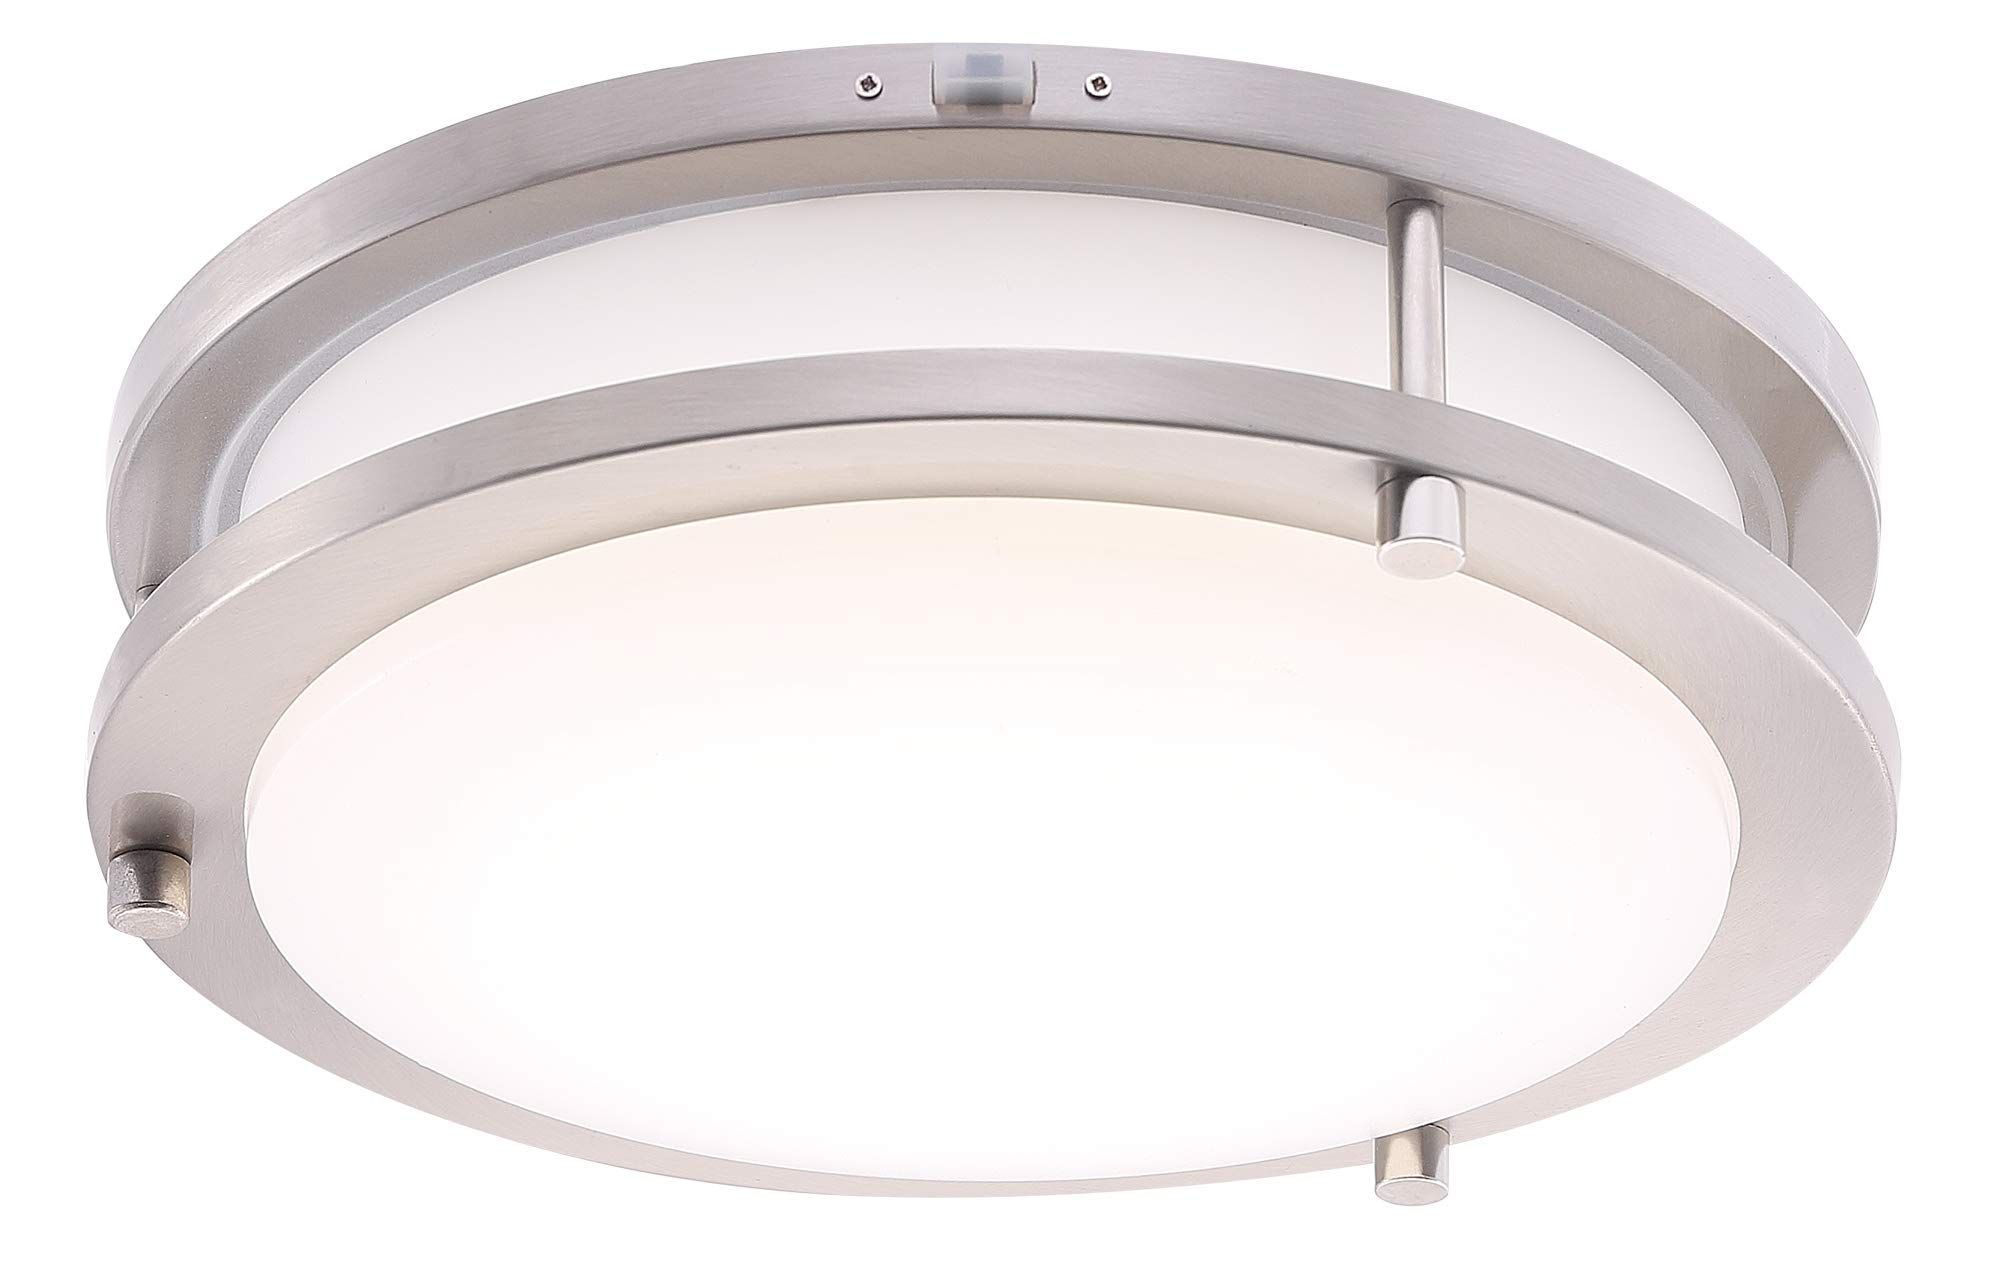 Small Bathroom Ceiling In 2020 Bathroom Ceiling Flush Mount Ceiling Lights Ceiling Lamp